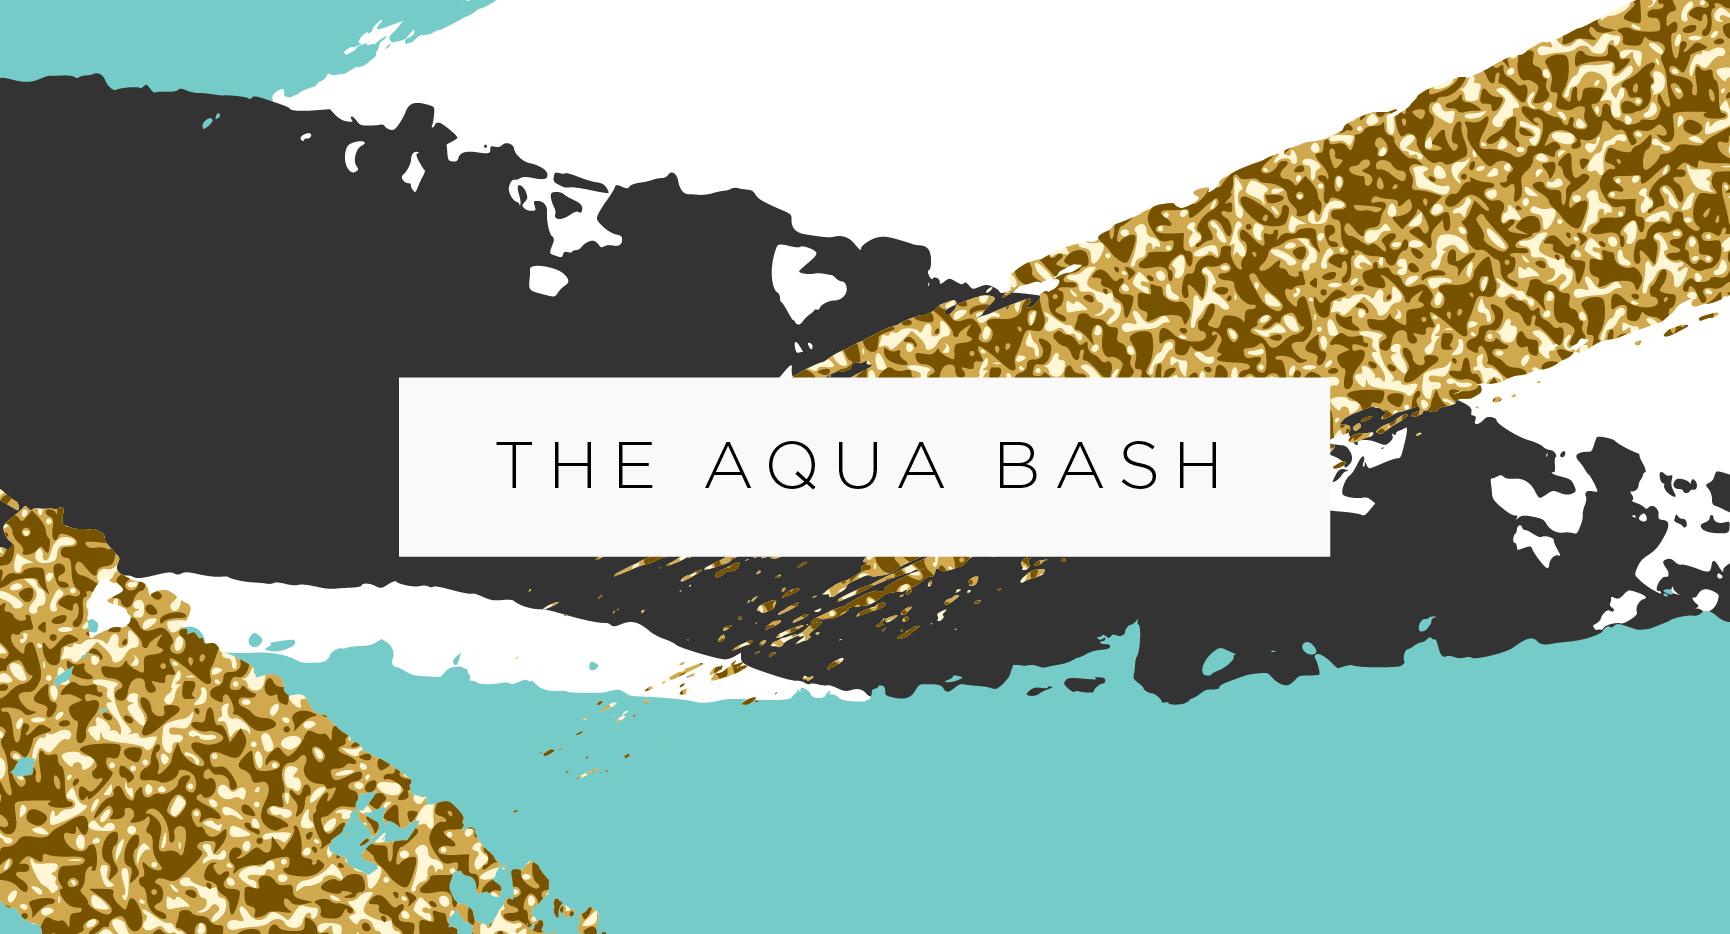 The Aqua Bash